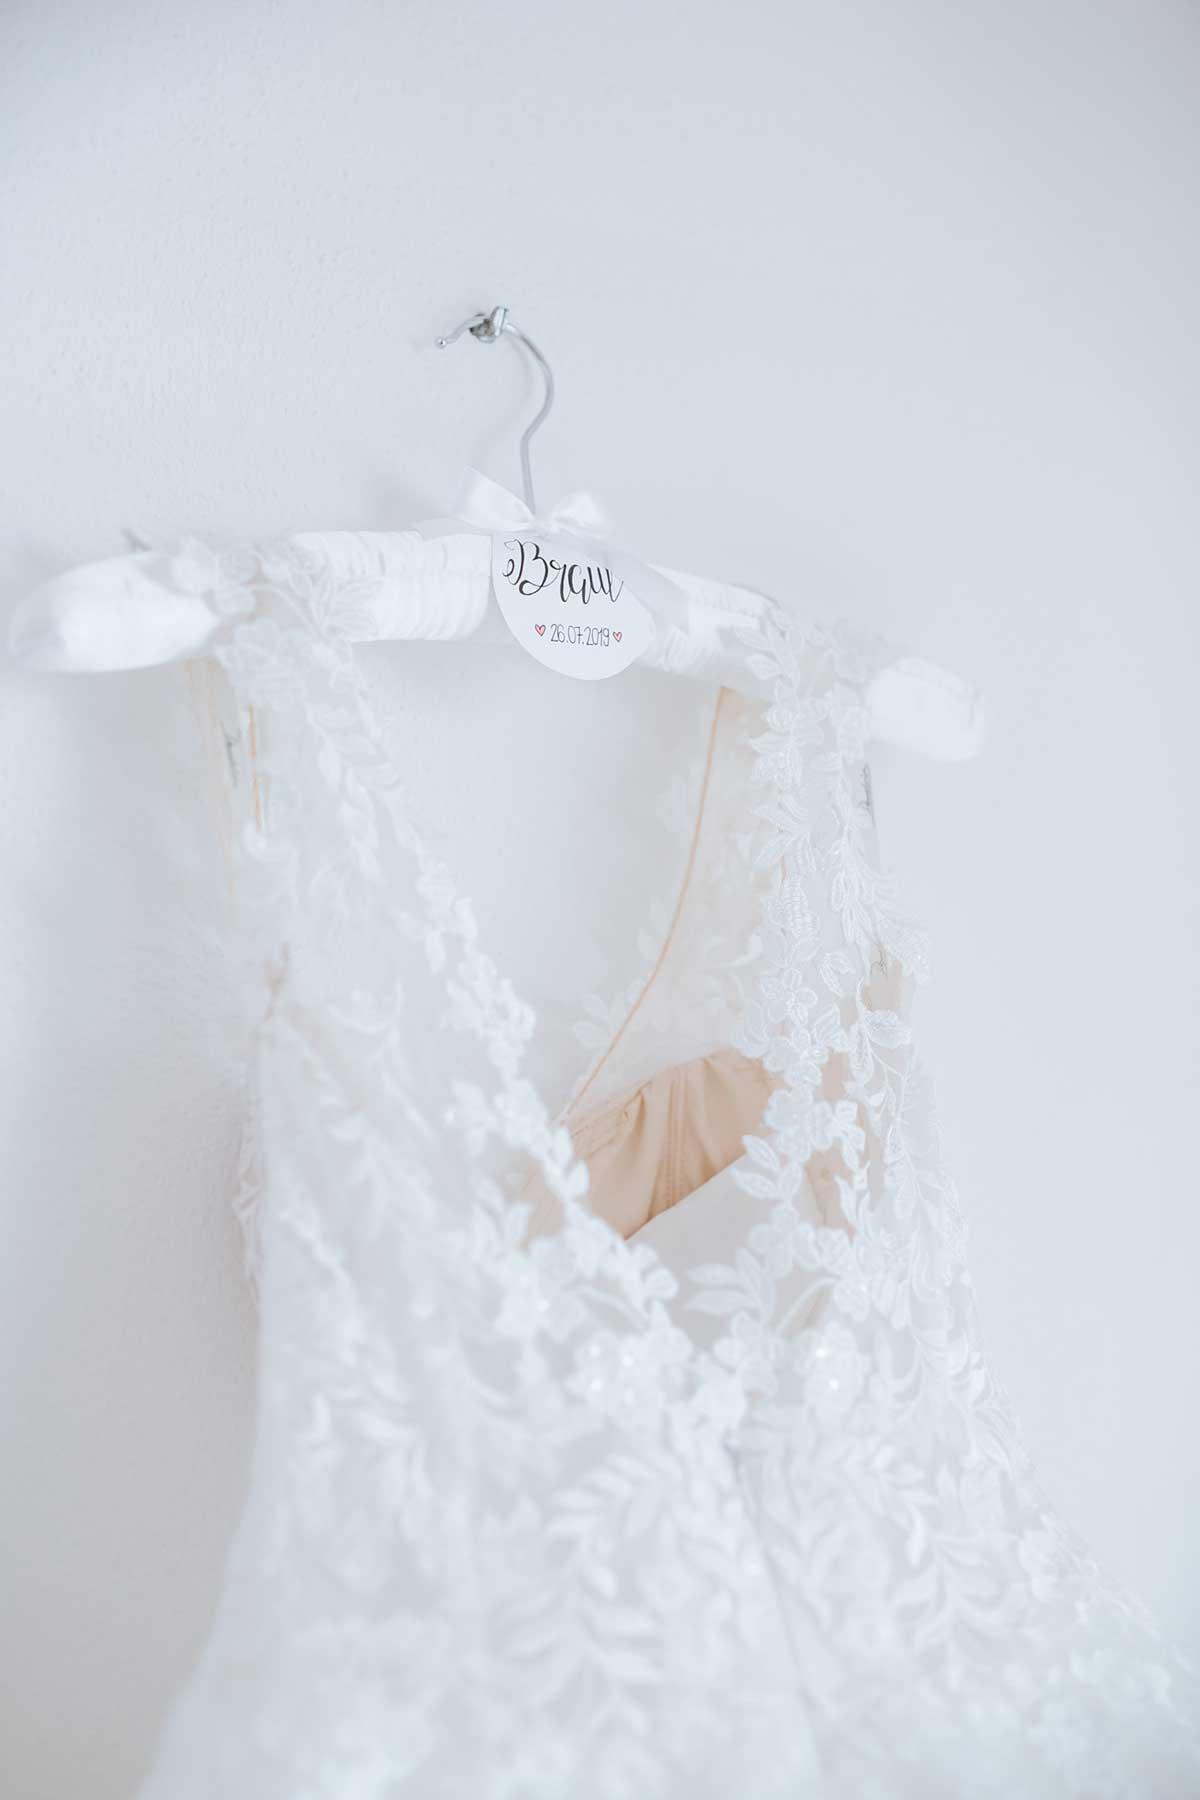 Brautkleid an pesonalisierten Kleiderbügel